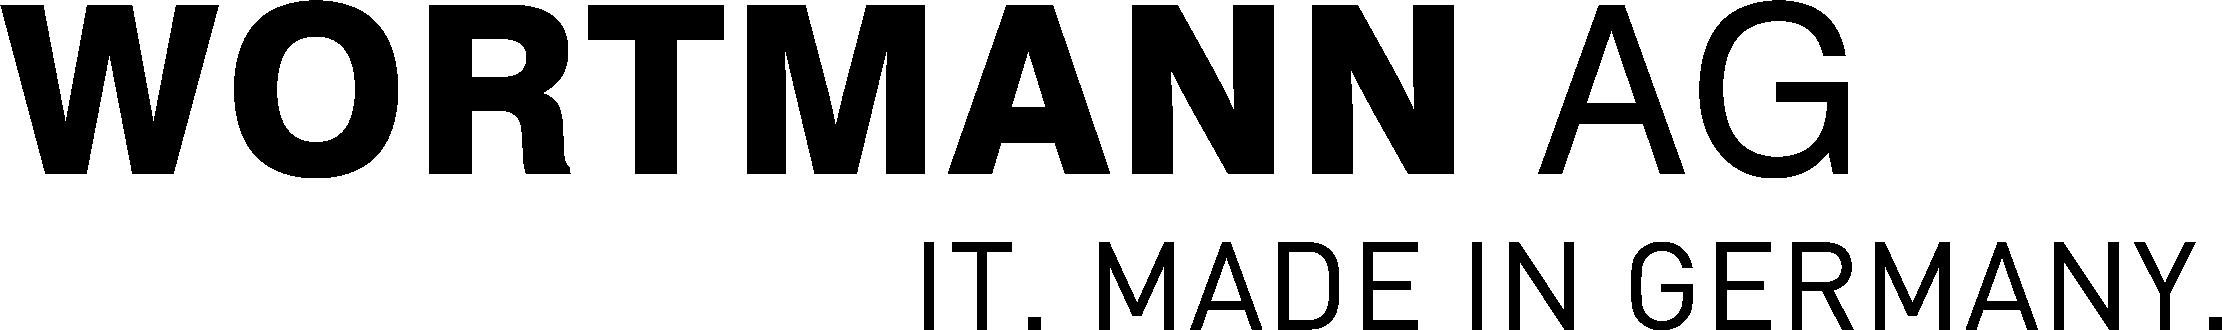 WORTMANN-AG-unterzeile-rechts-schwarz.png